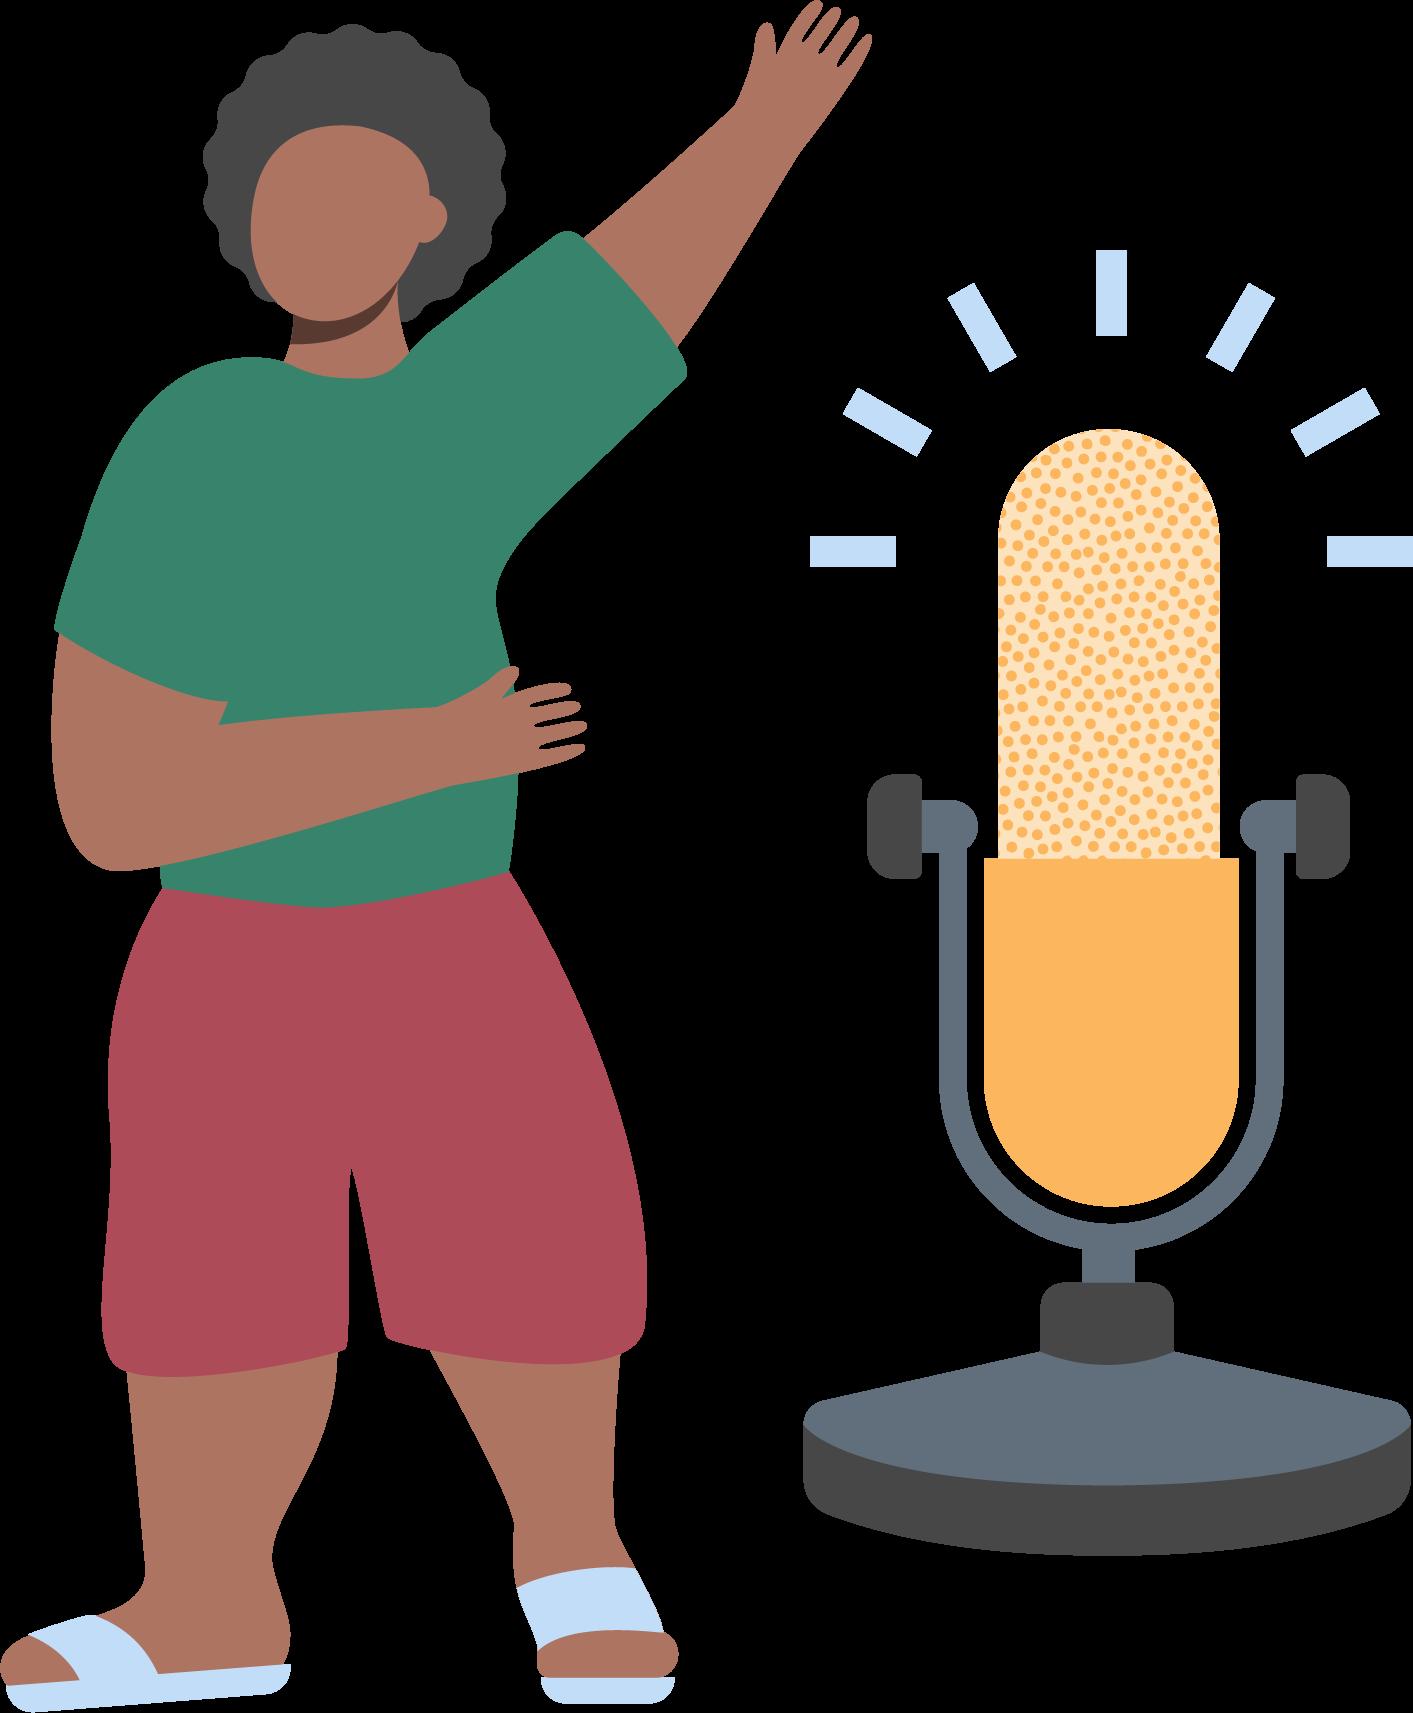 microphone person icon